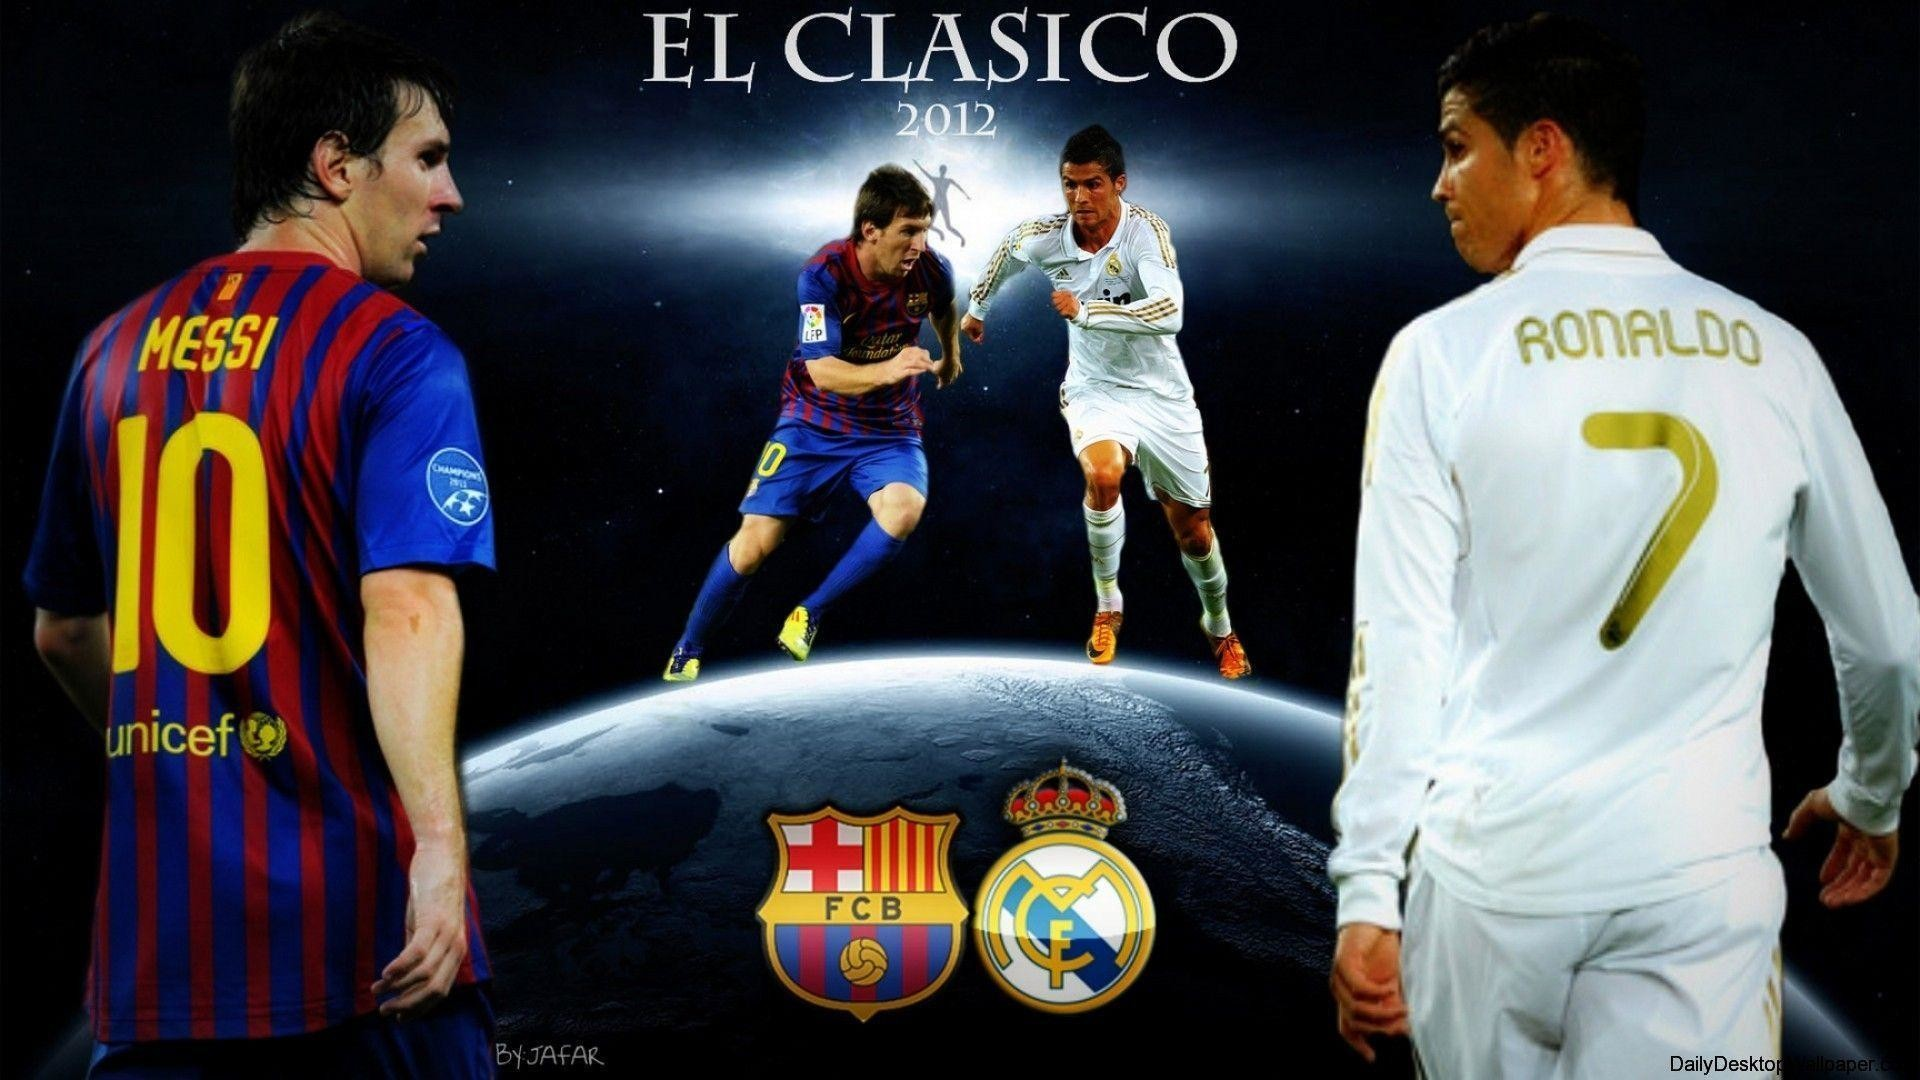 1920x1080 Messi And Ronaldo 2012 Wallpaper HD Free Wallpapers